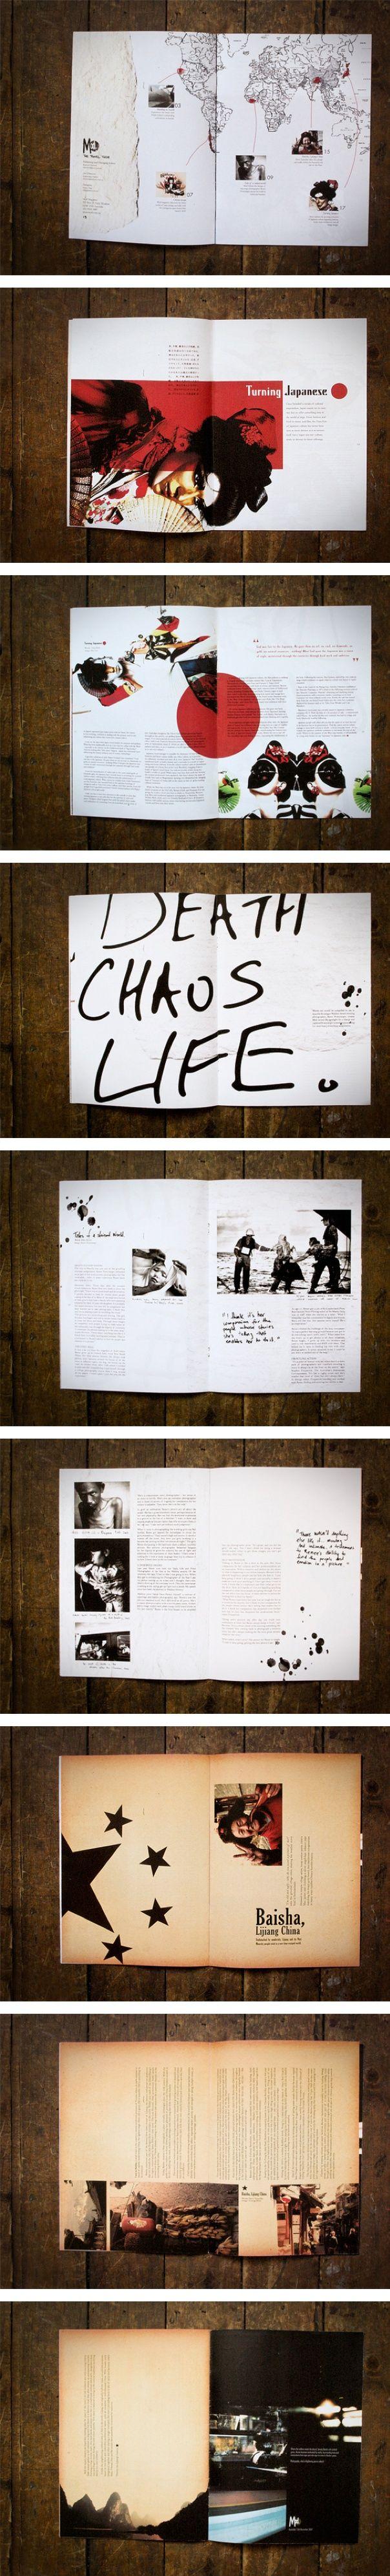 MOD Magazine - Kathryn Ditchett        |         MagSpr...